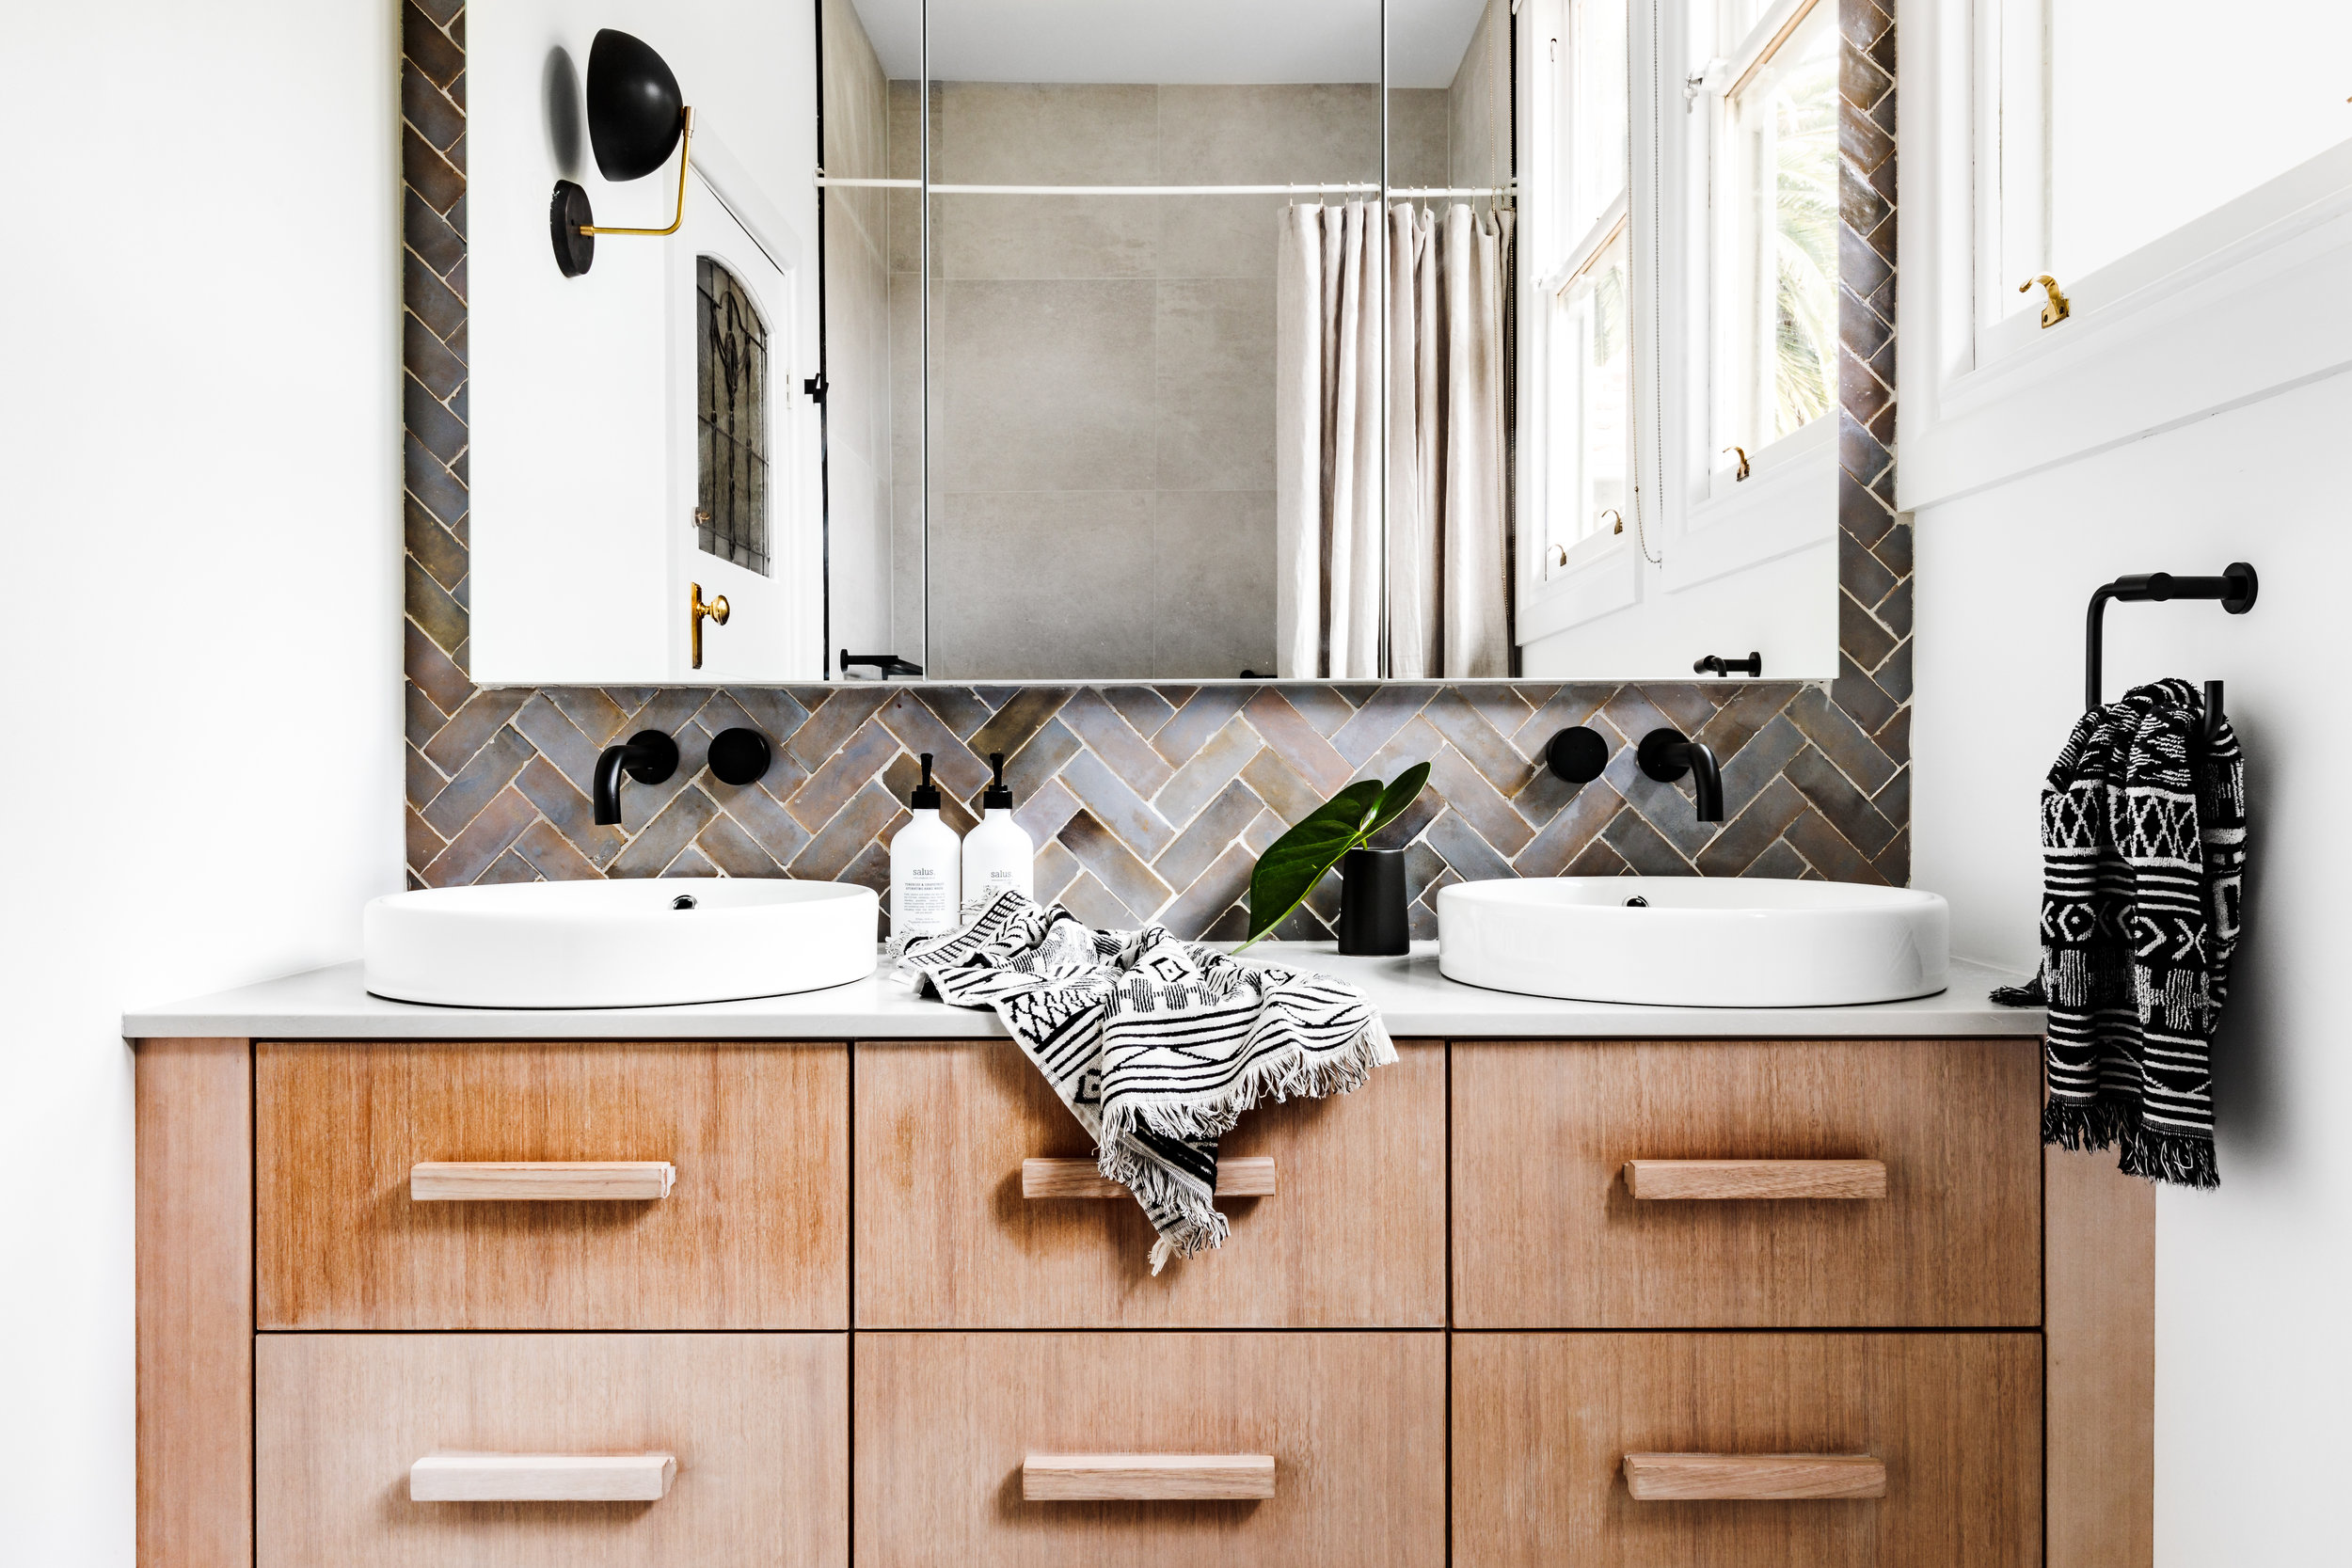 Interior Design -   Studio Ezra    Tiles -   Tiles of Ezra    Benchtop -   Caesarstone